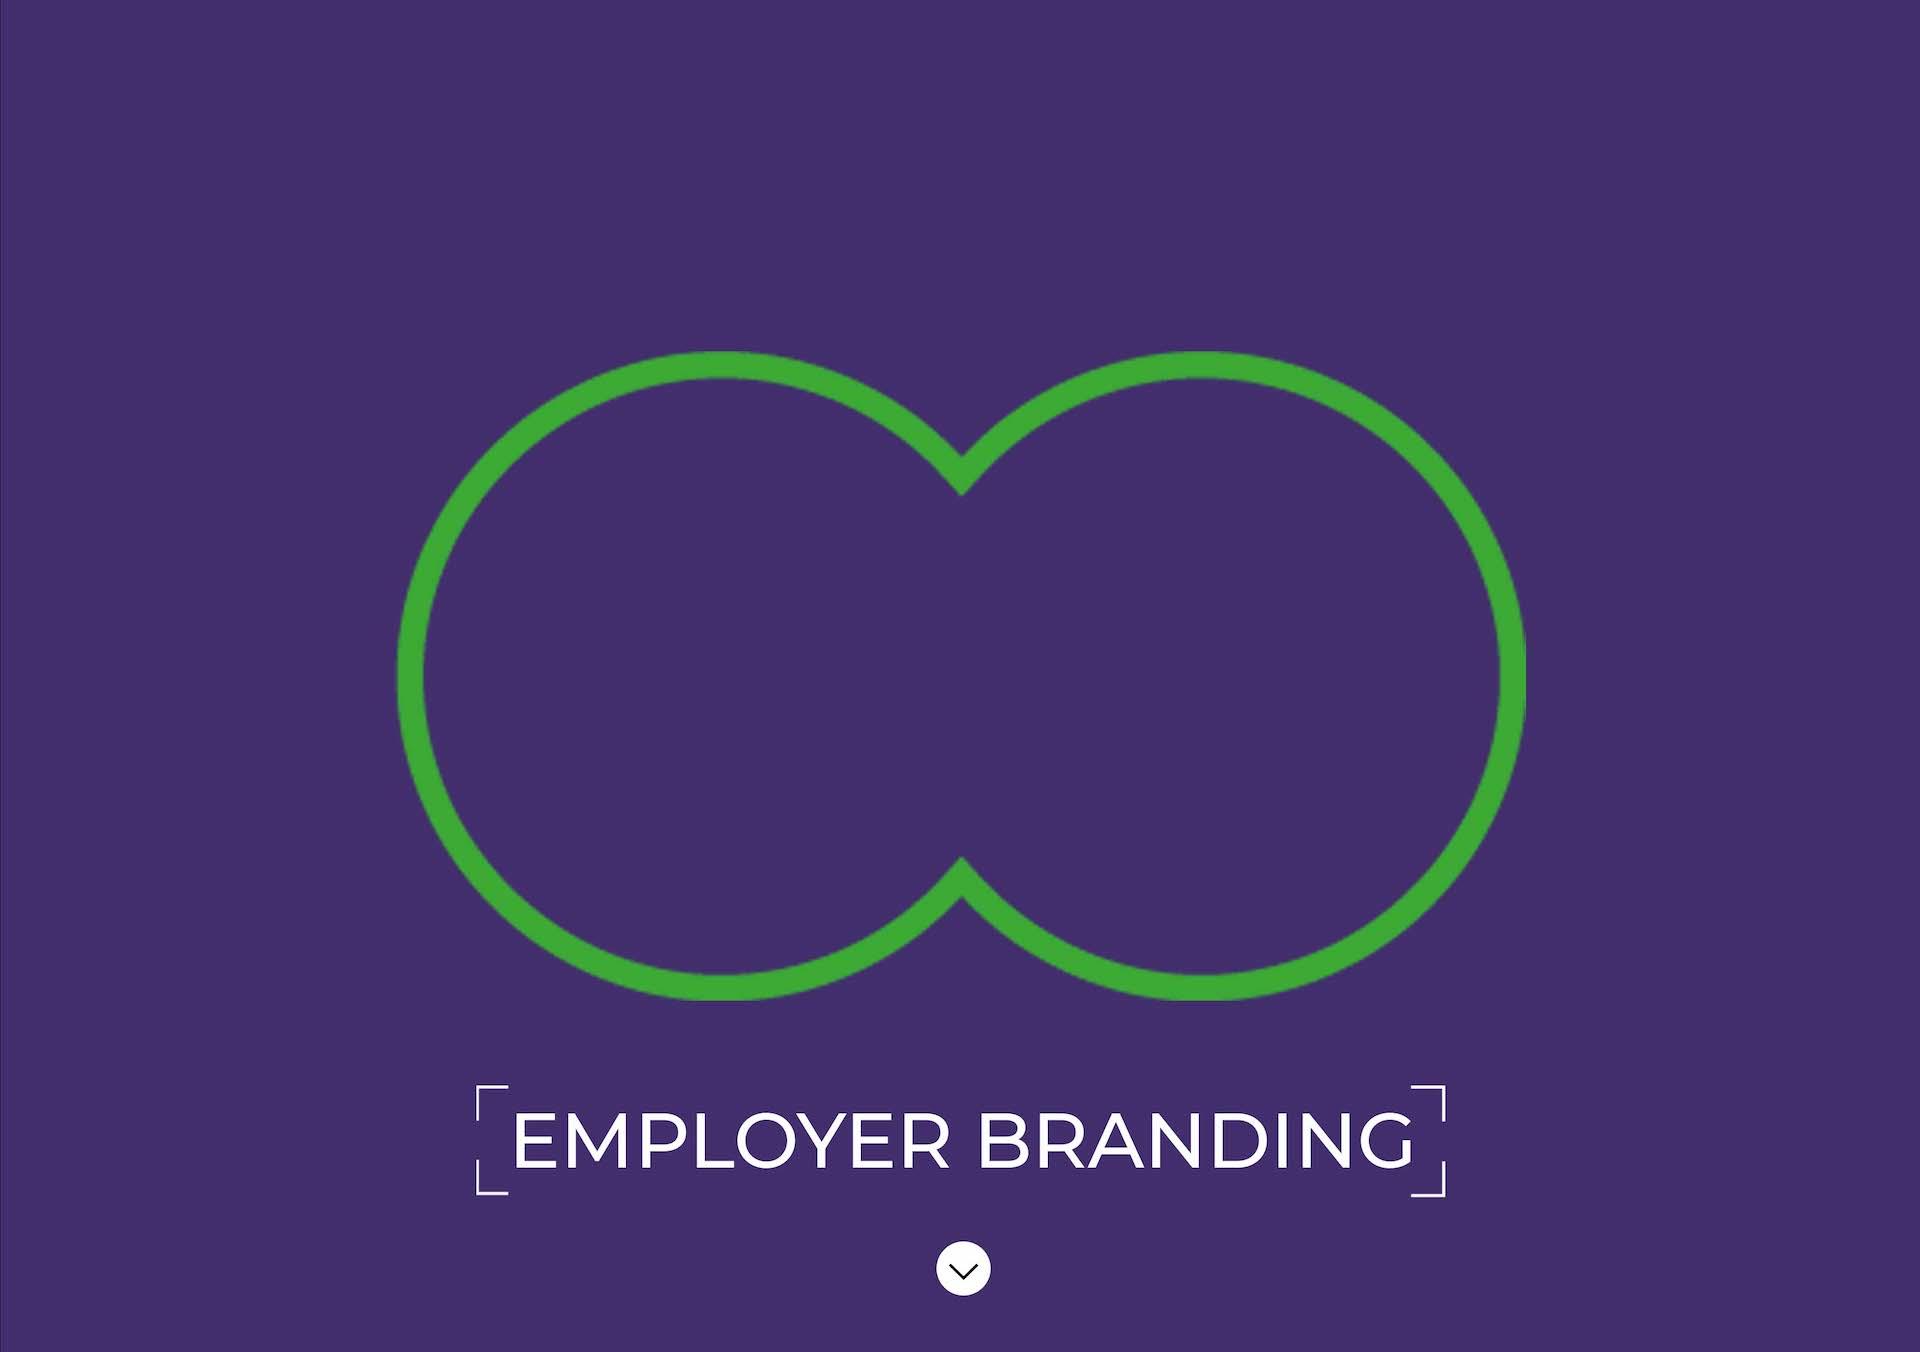 greenmoon-employer-branding